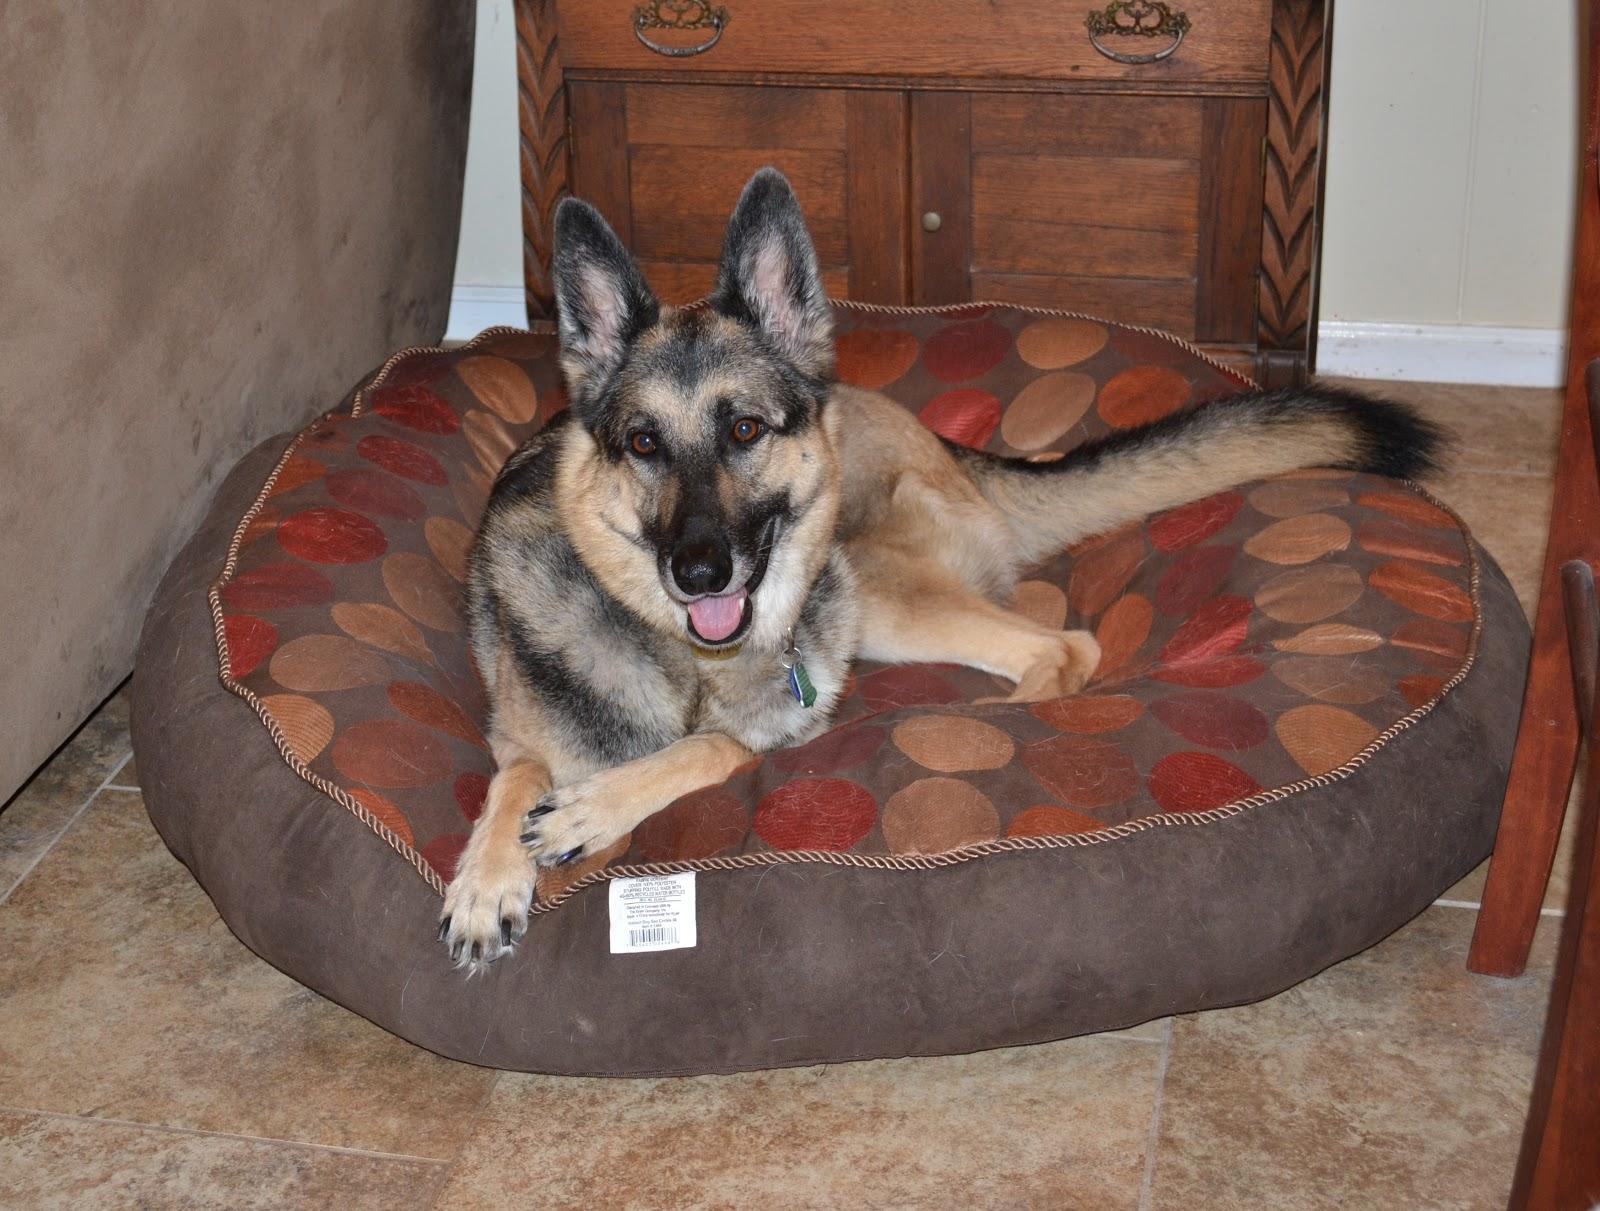 Turke The German Shepherd Dog